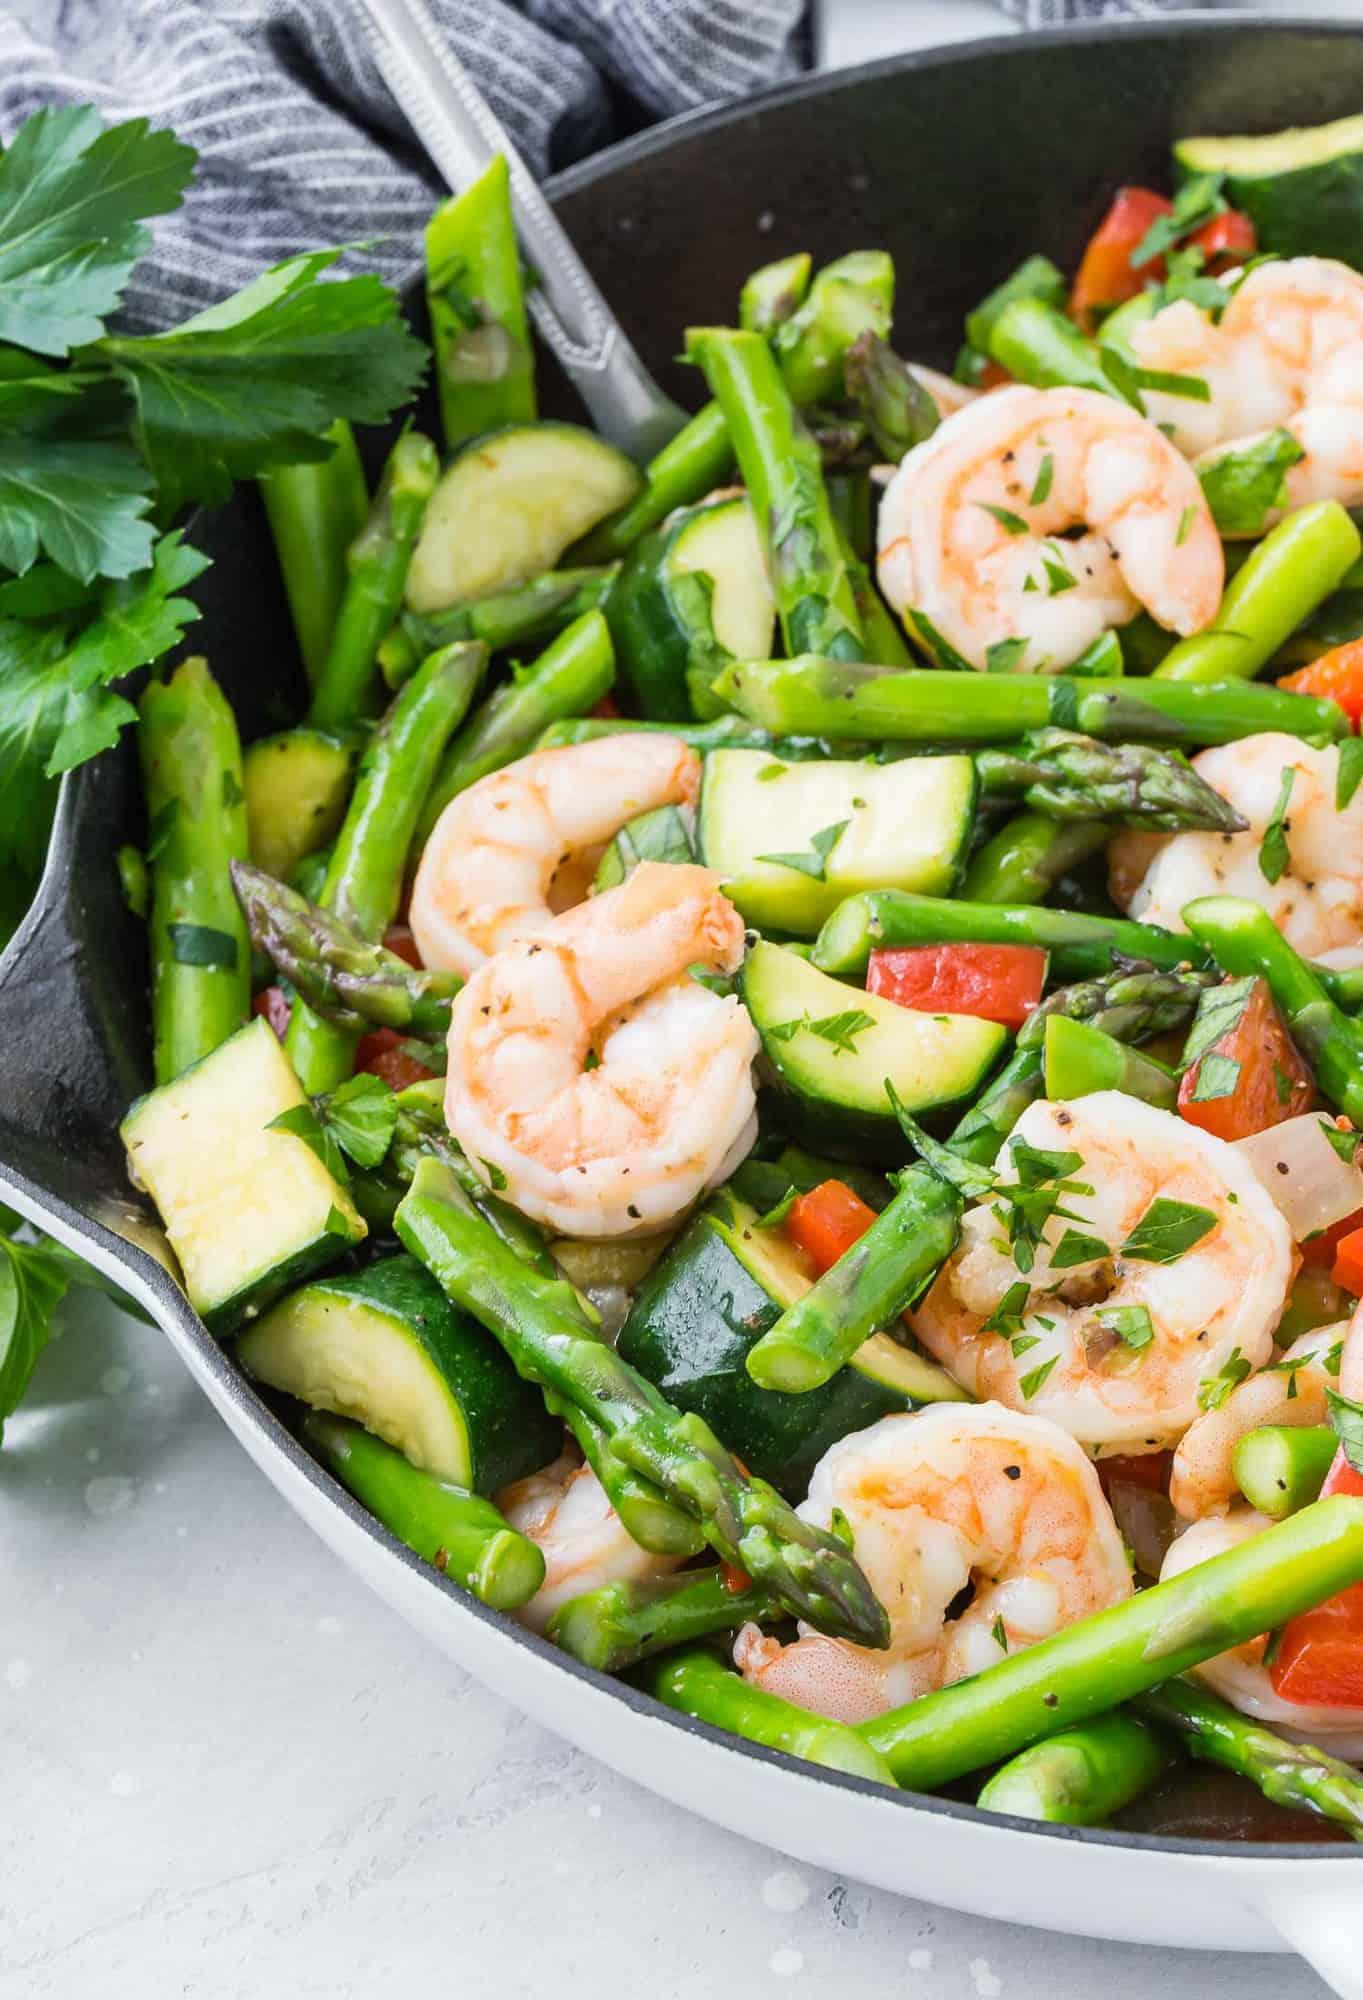 Shrimp and vegetables in a white skillet.